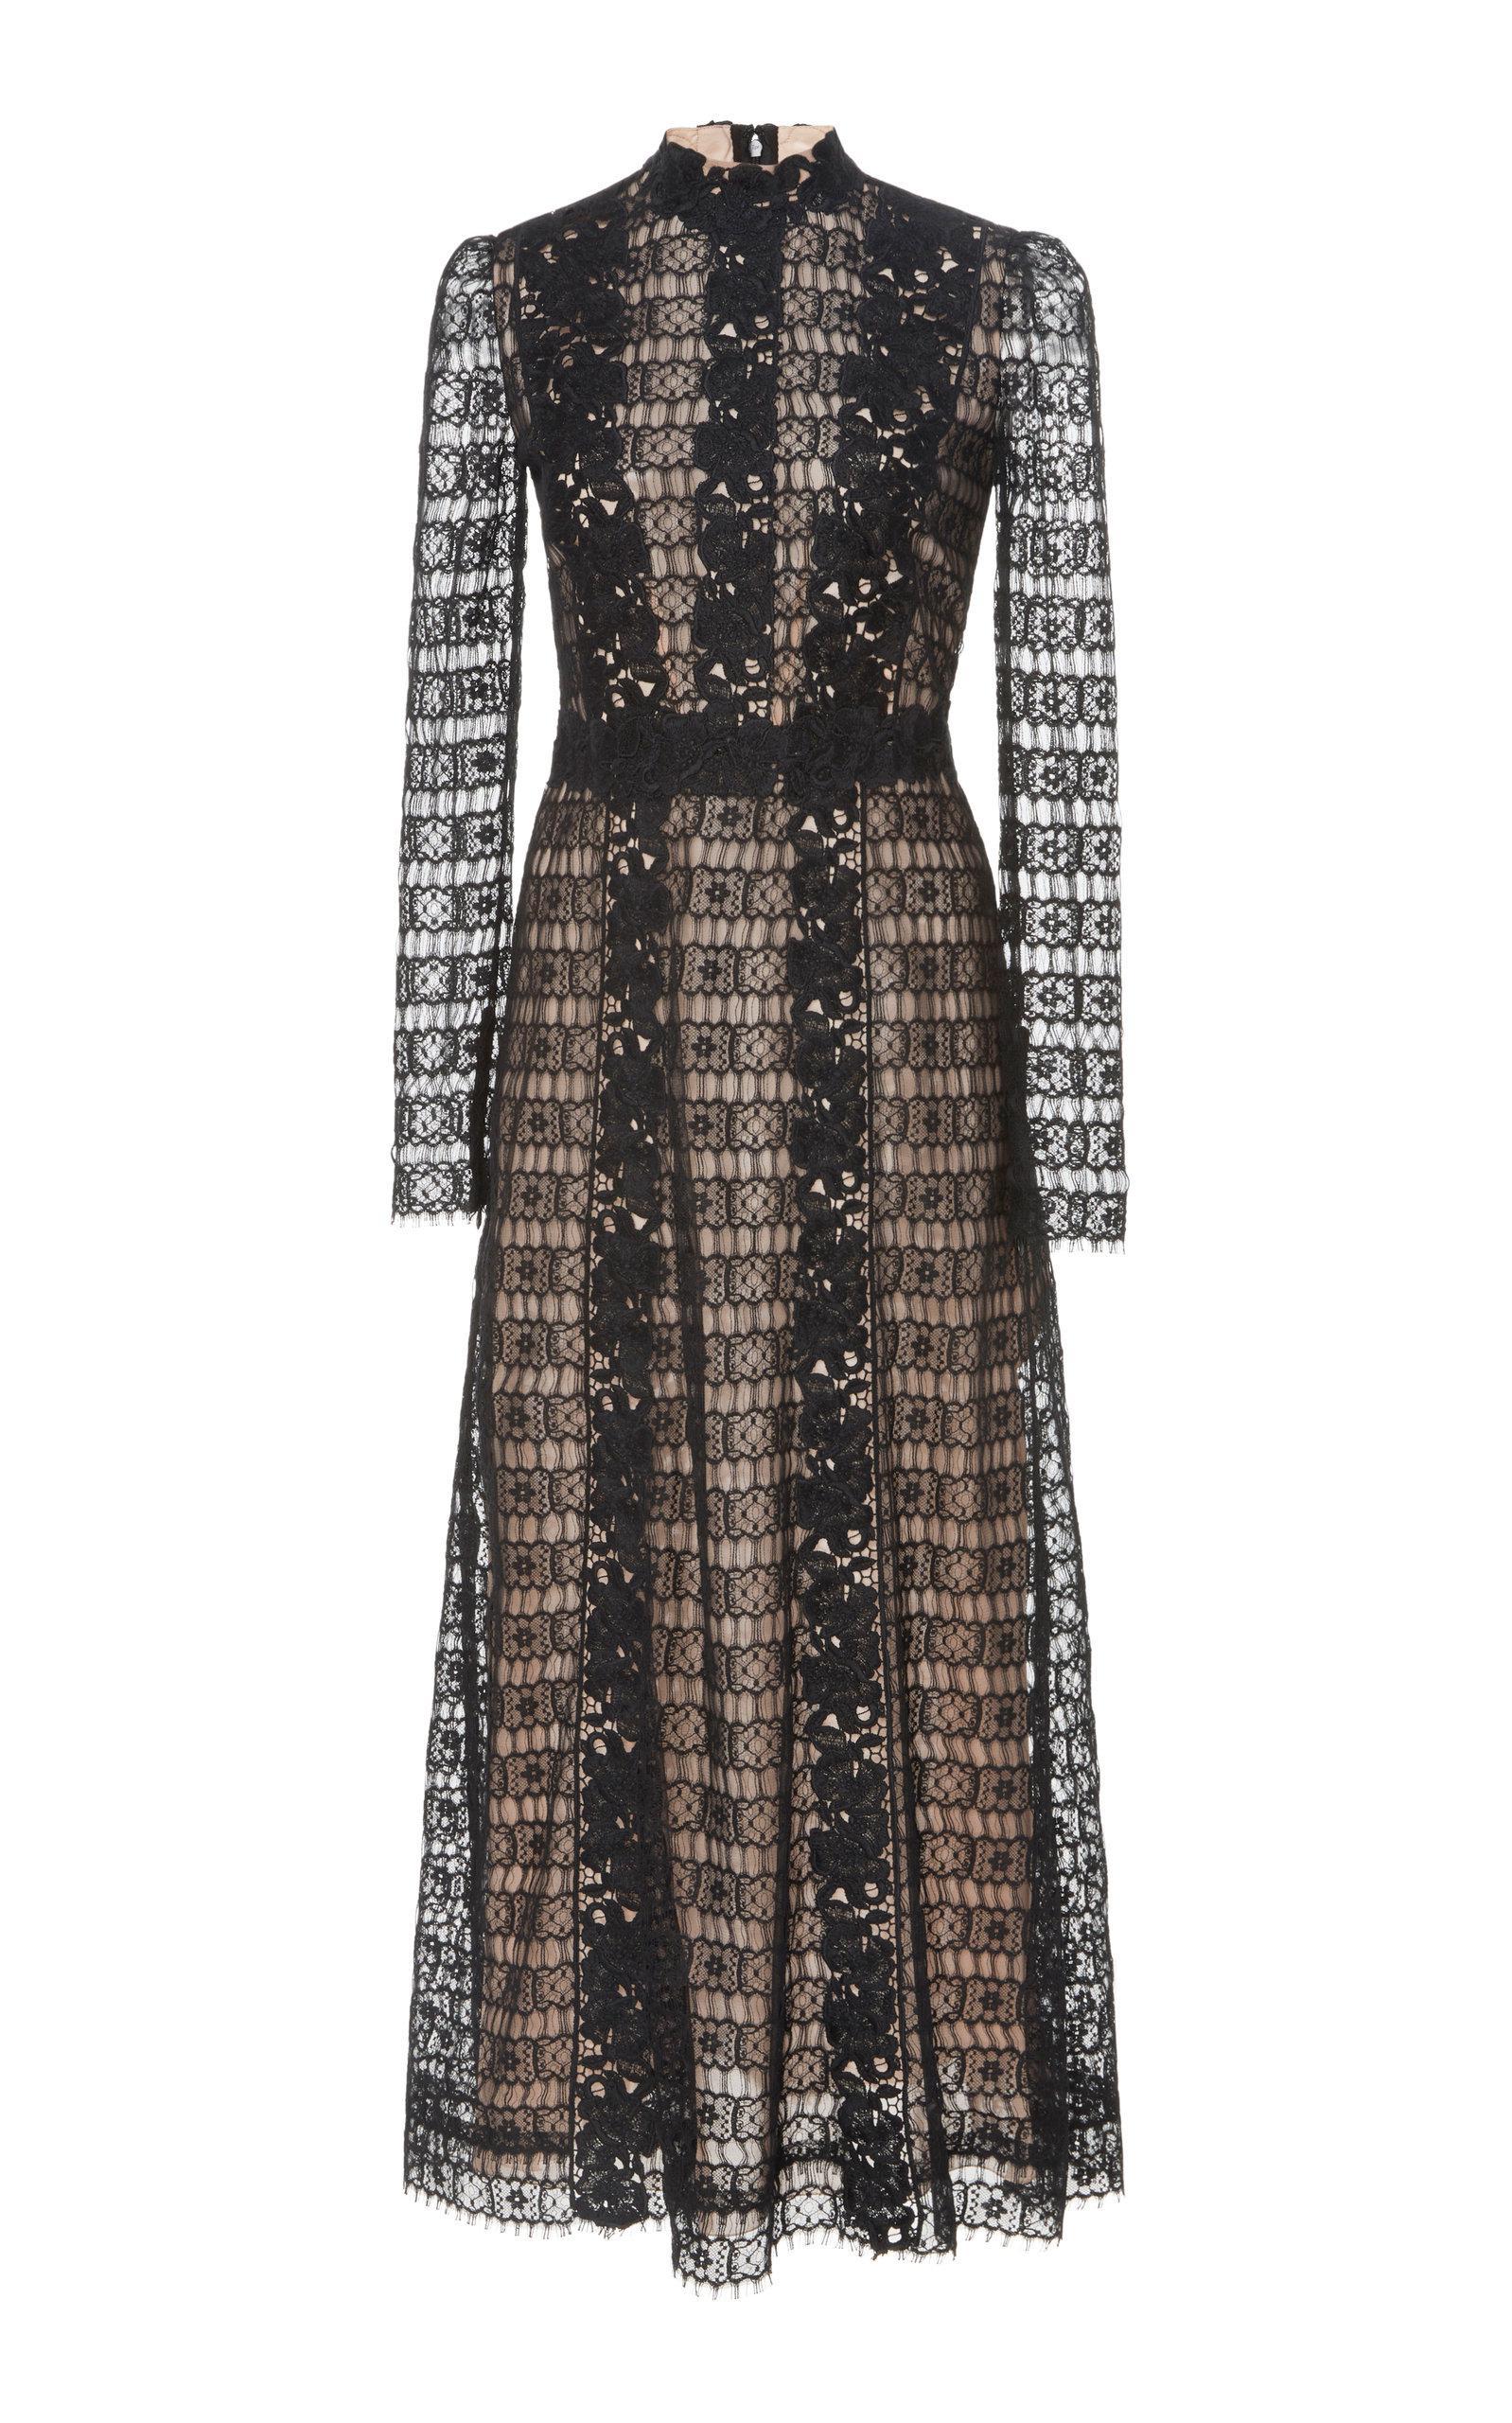 9152bbdfa0 Lyst - Giambattista Valli Long Sleeve Midi Dress in Black